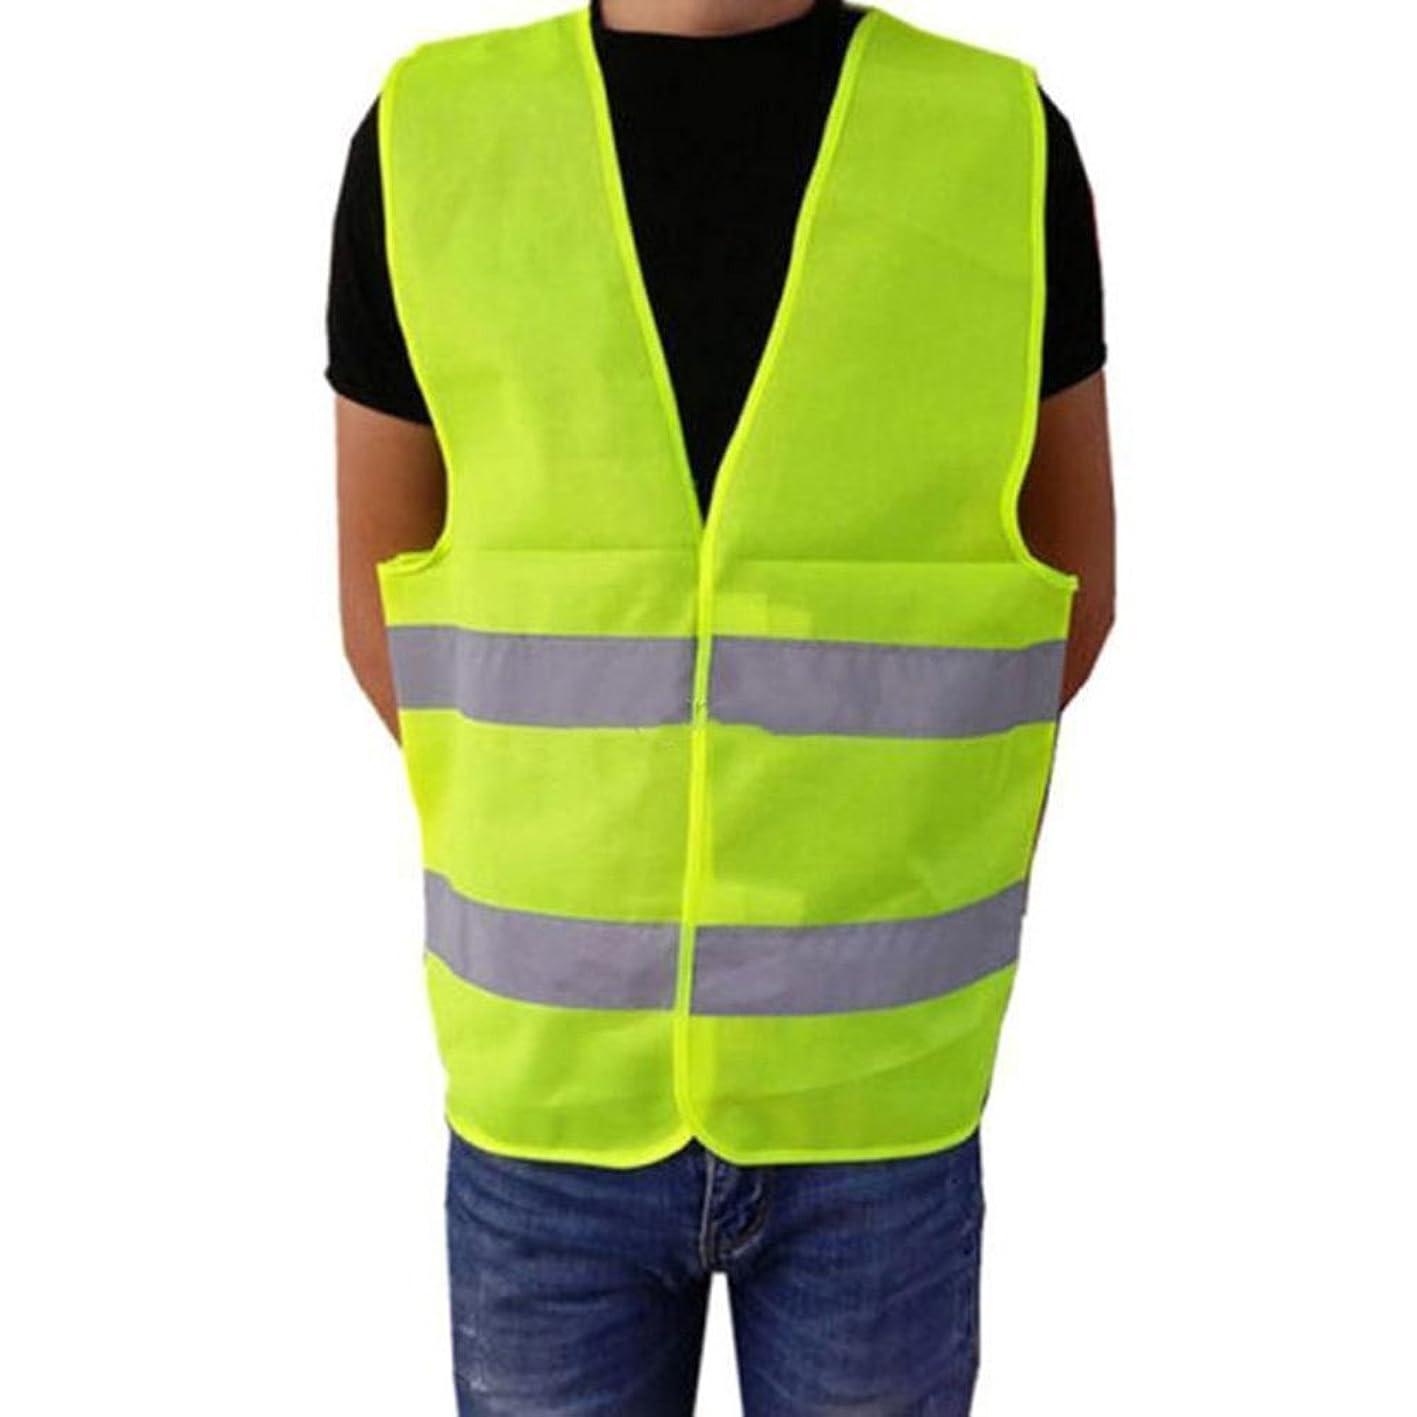 Sundatebe Reflective Stripes Safety Guard Vest High Visibility Warning Vest asjoyjalqzq536